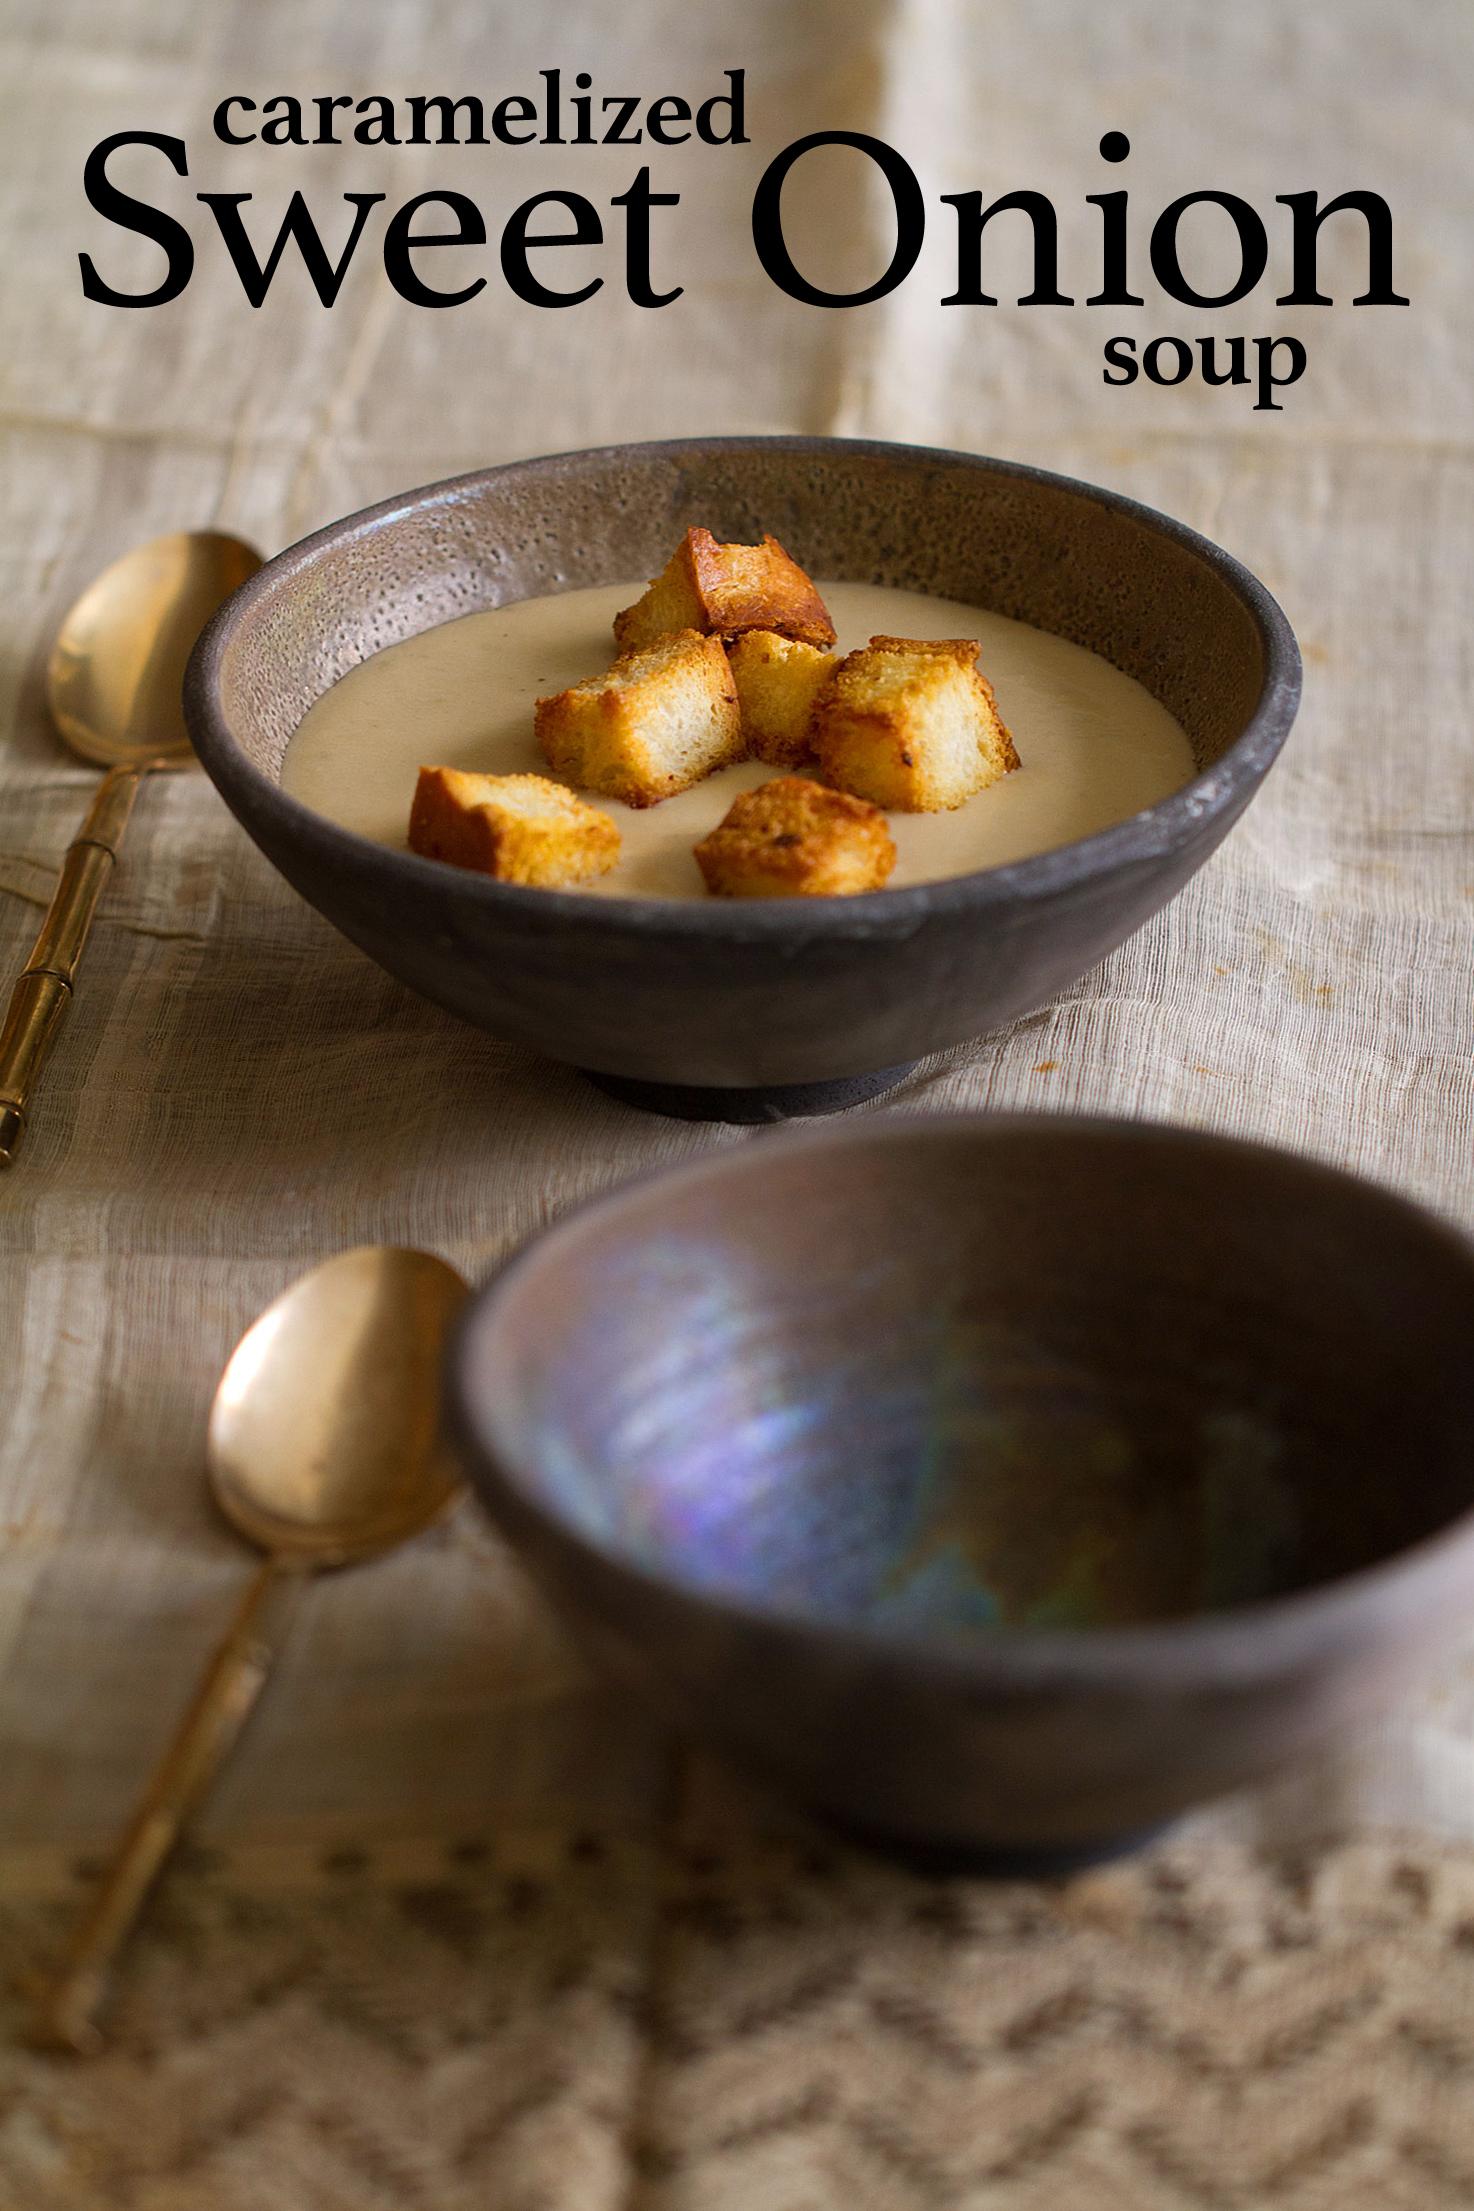 Caramelized Sweet Onion Soup